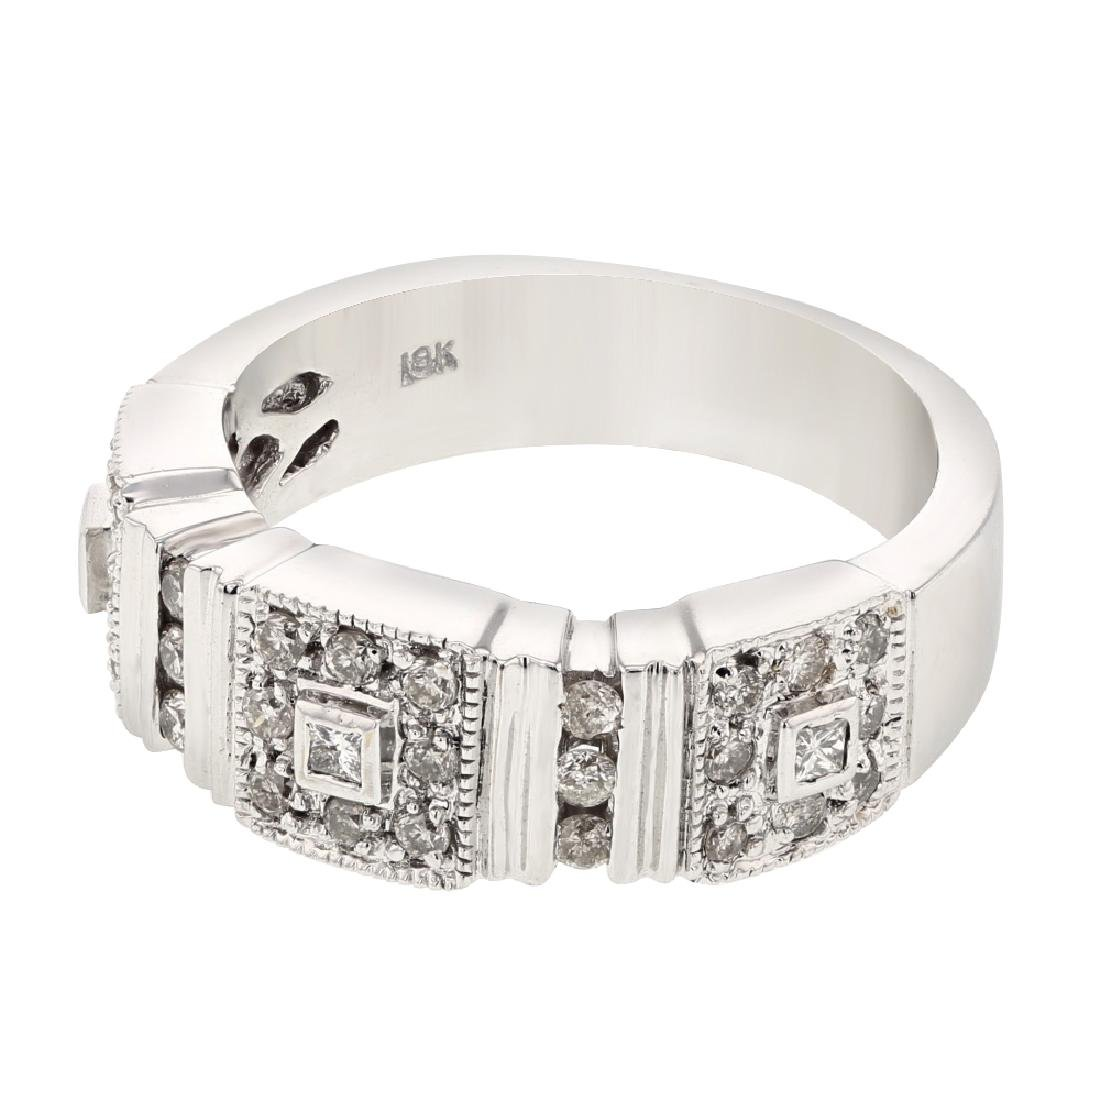 0.5 CTW Diamond Fashion  Ring in 18K White Gold